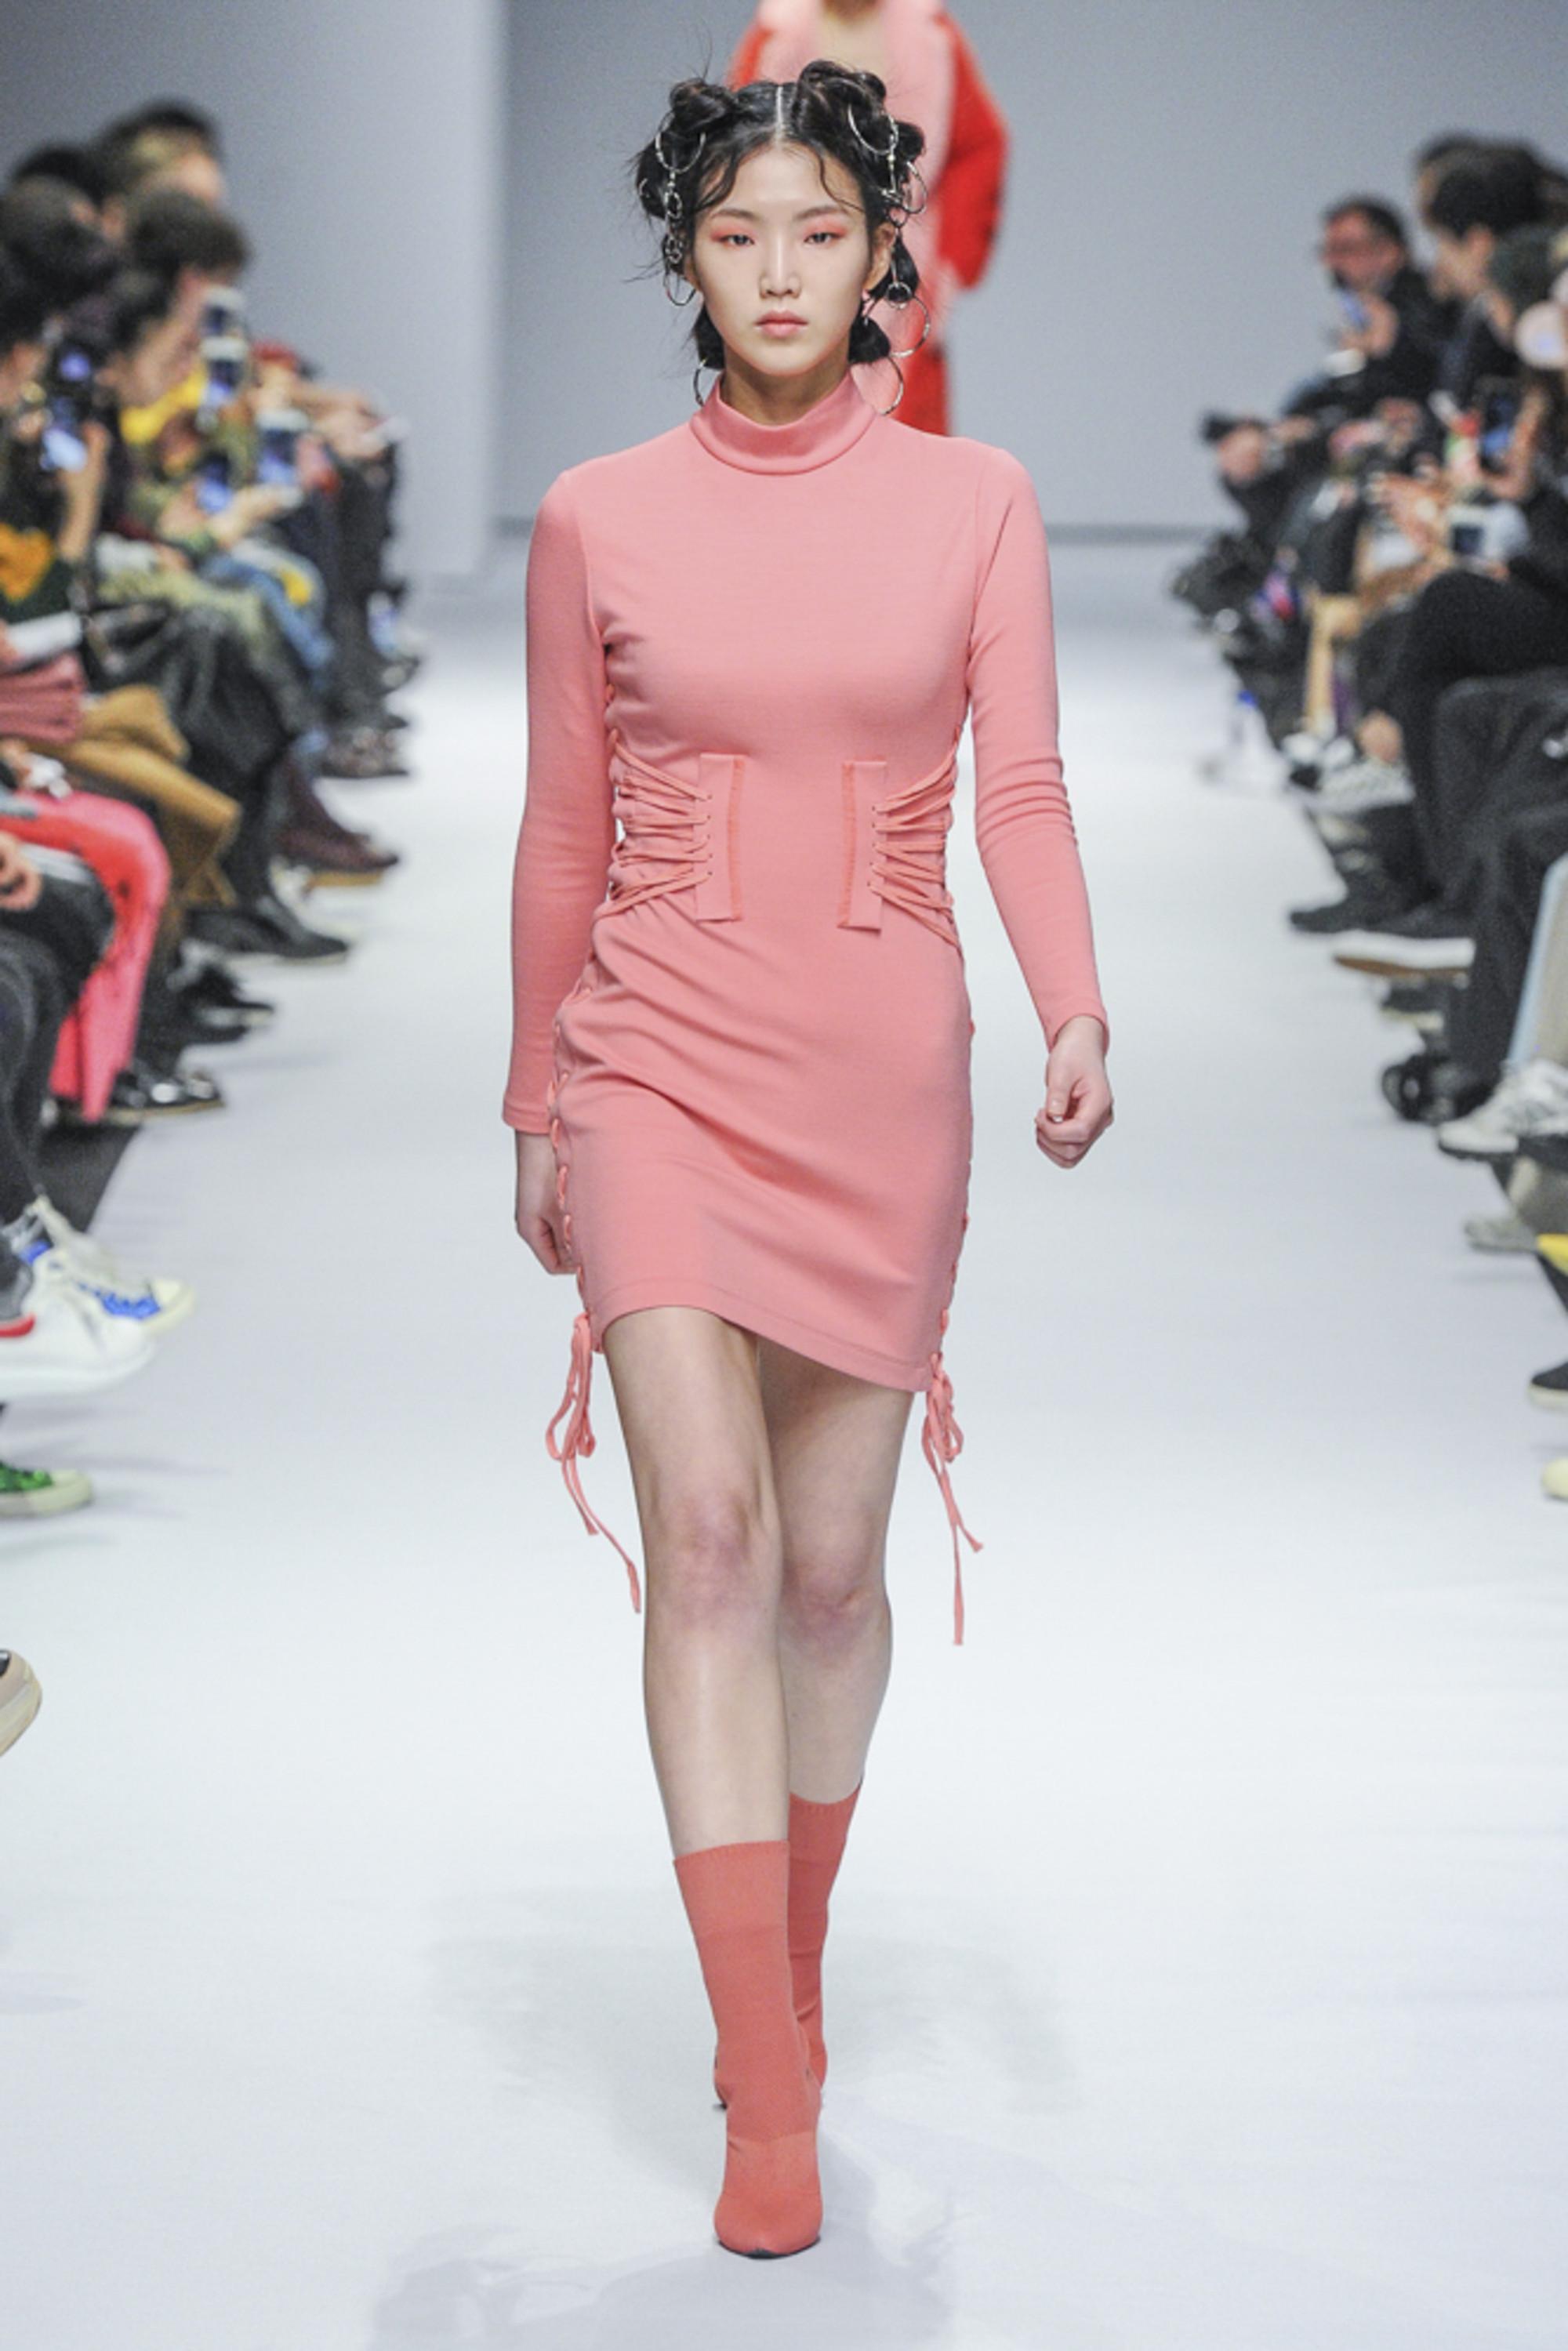 Kye короткое розовое платье 2019 со шнуровкой